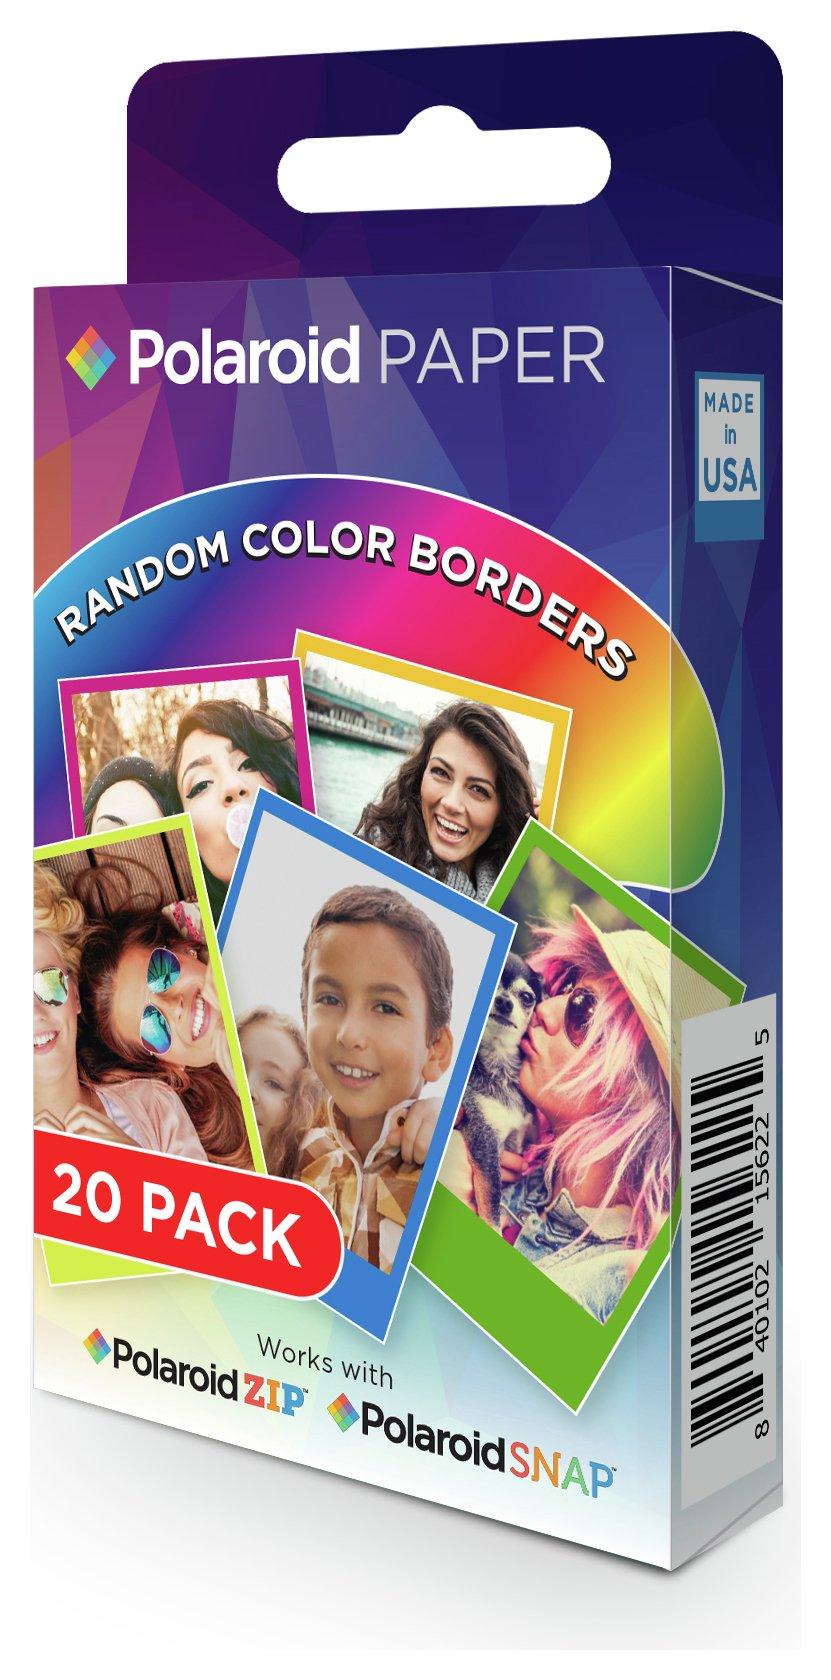 polaroid-rainbow-border-paper-20-pack